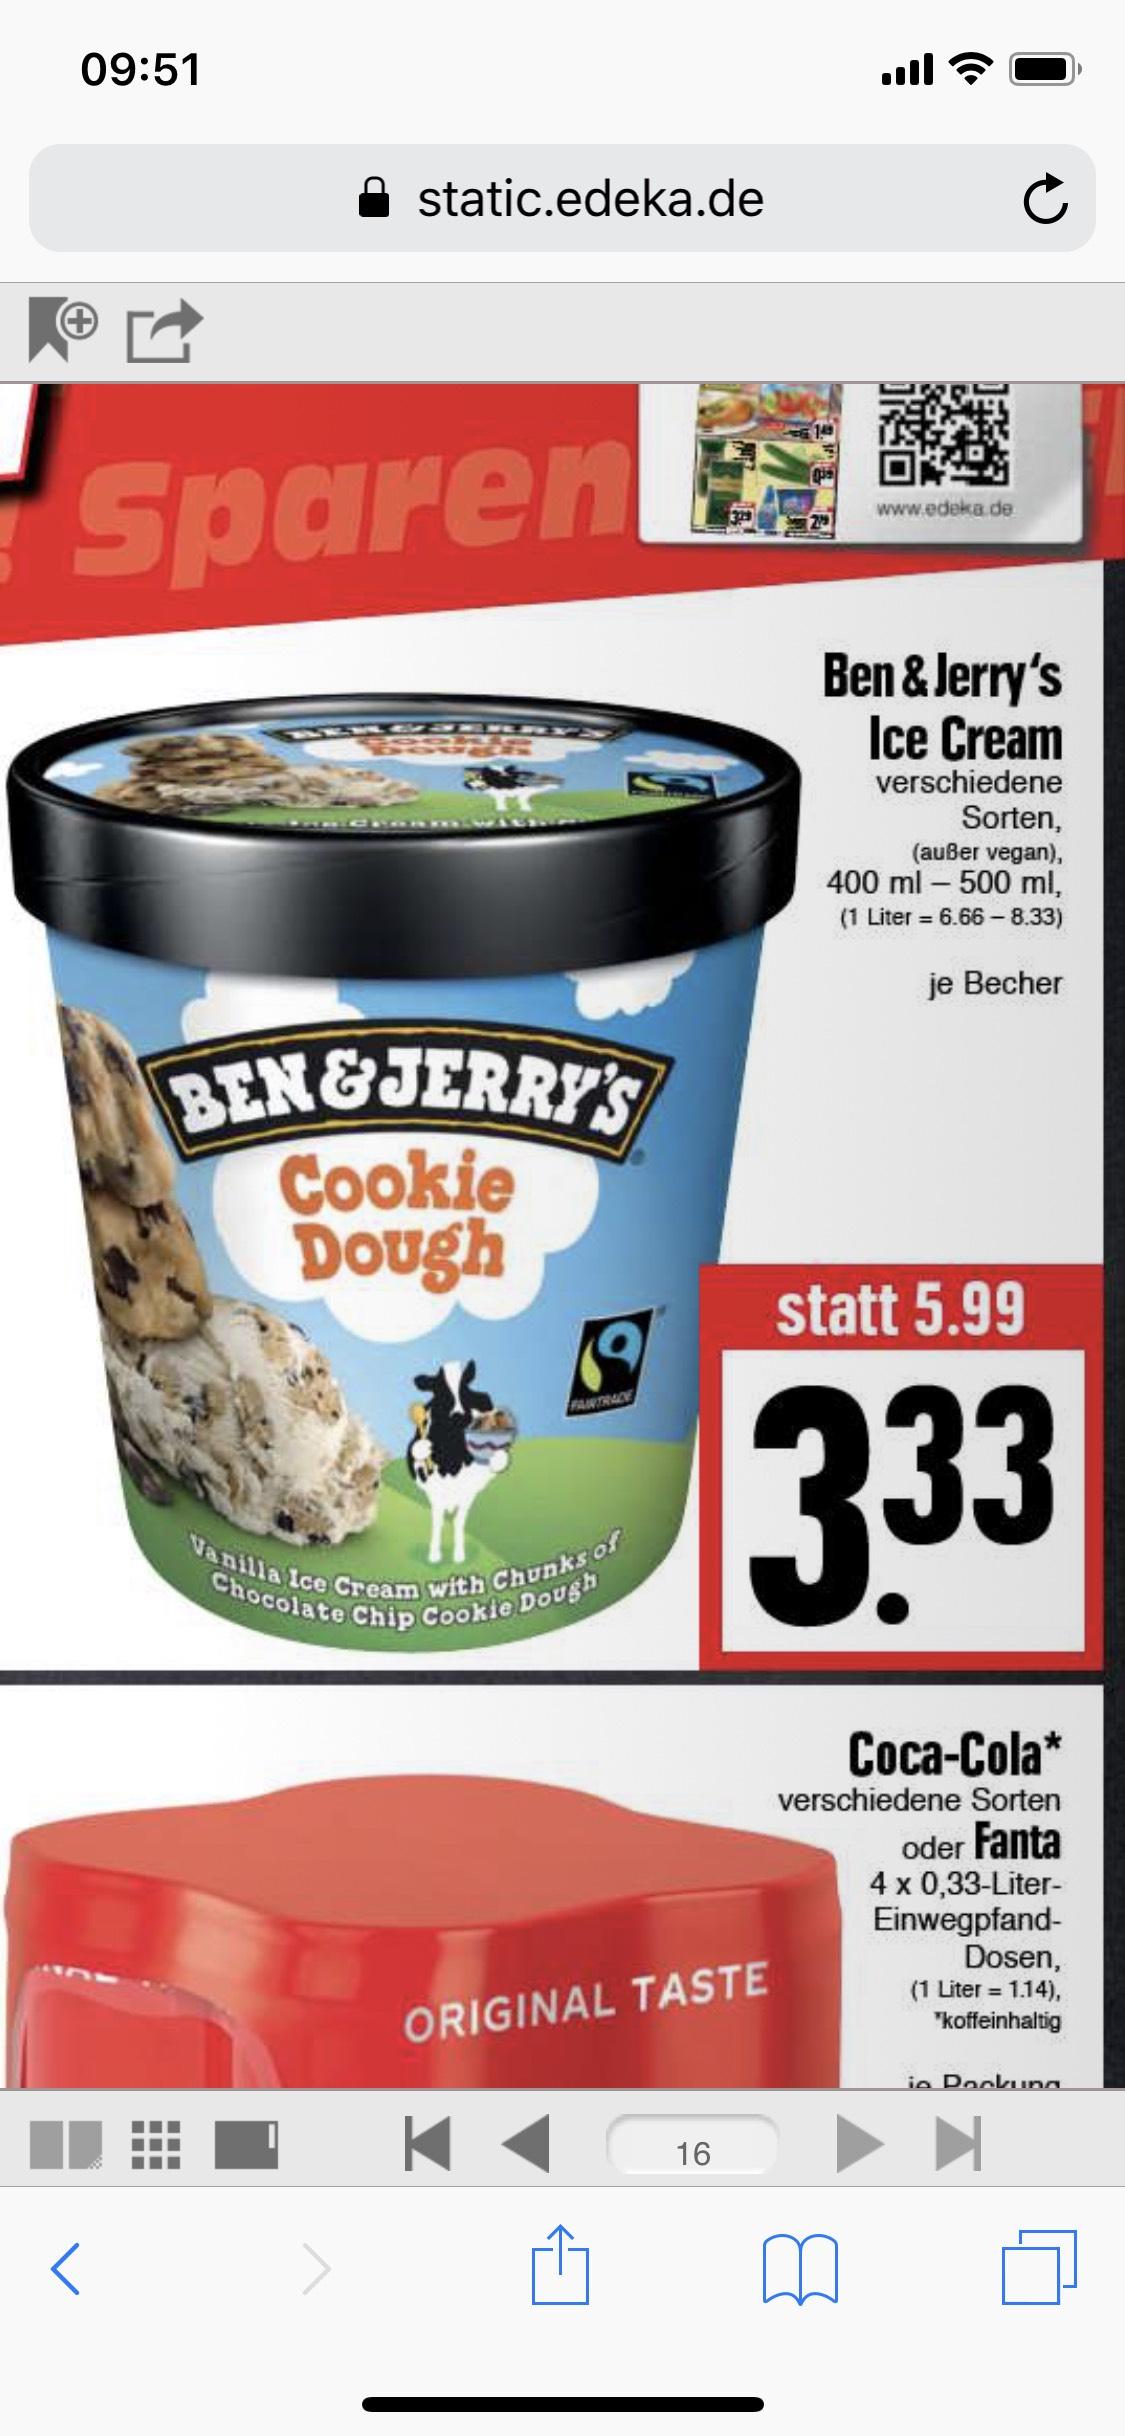 LOKAL Ben & Jerry's Ice Cream - Verschiedene Sorten 400-500ml @ EDEKA